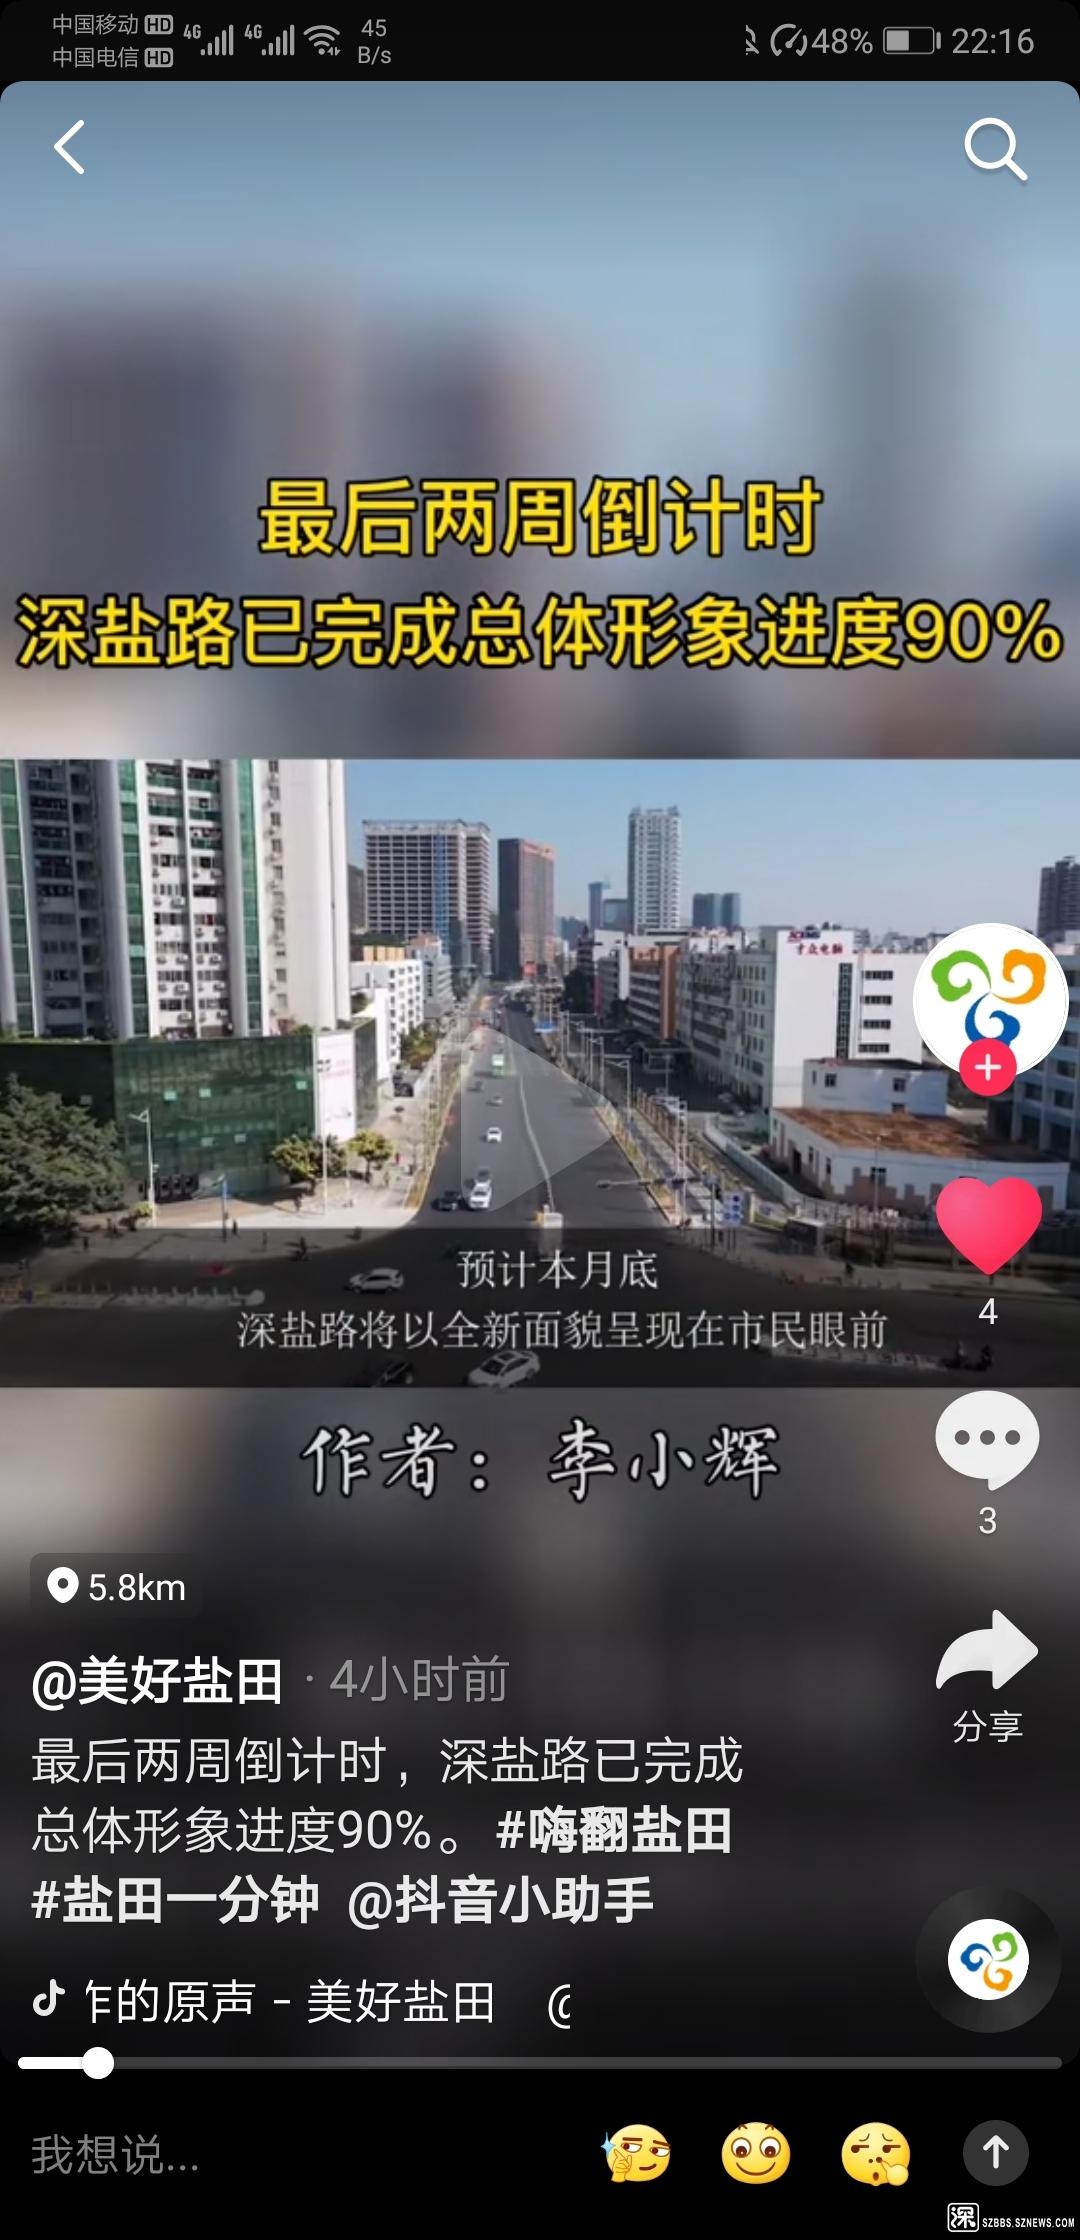 Screenshot_20210115_221606_com.ss.android.ugc.aweme.jpg